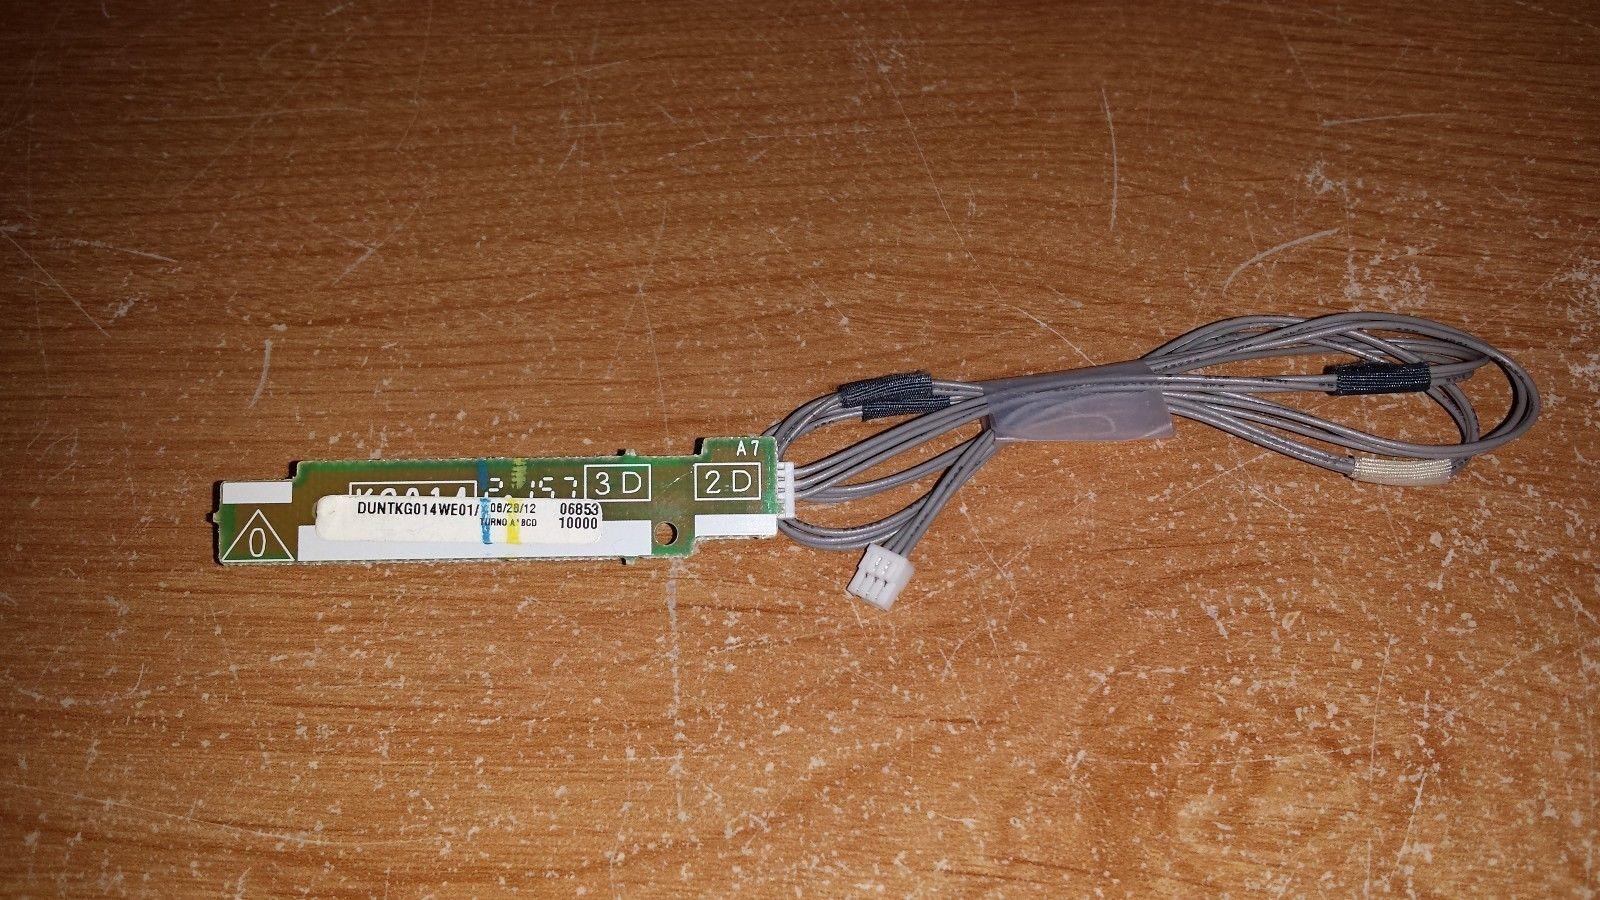 Sharp LC-60LE600U - Interface Board w/cable (RUNTKG014WE01)